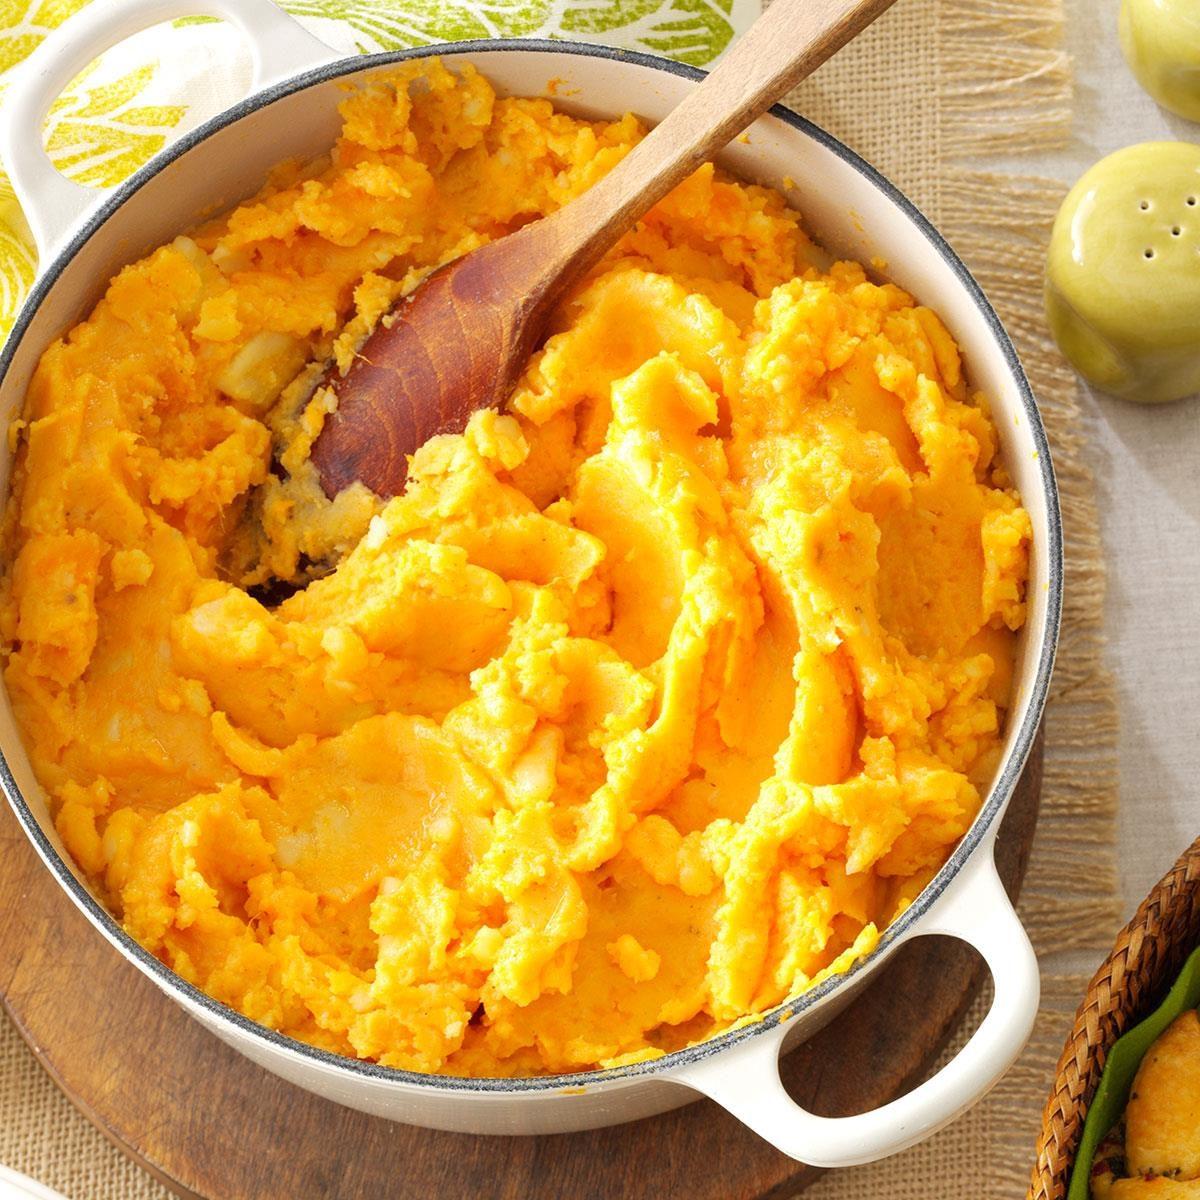 Louisiana: Gouda Mixed Potato Mash